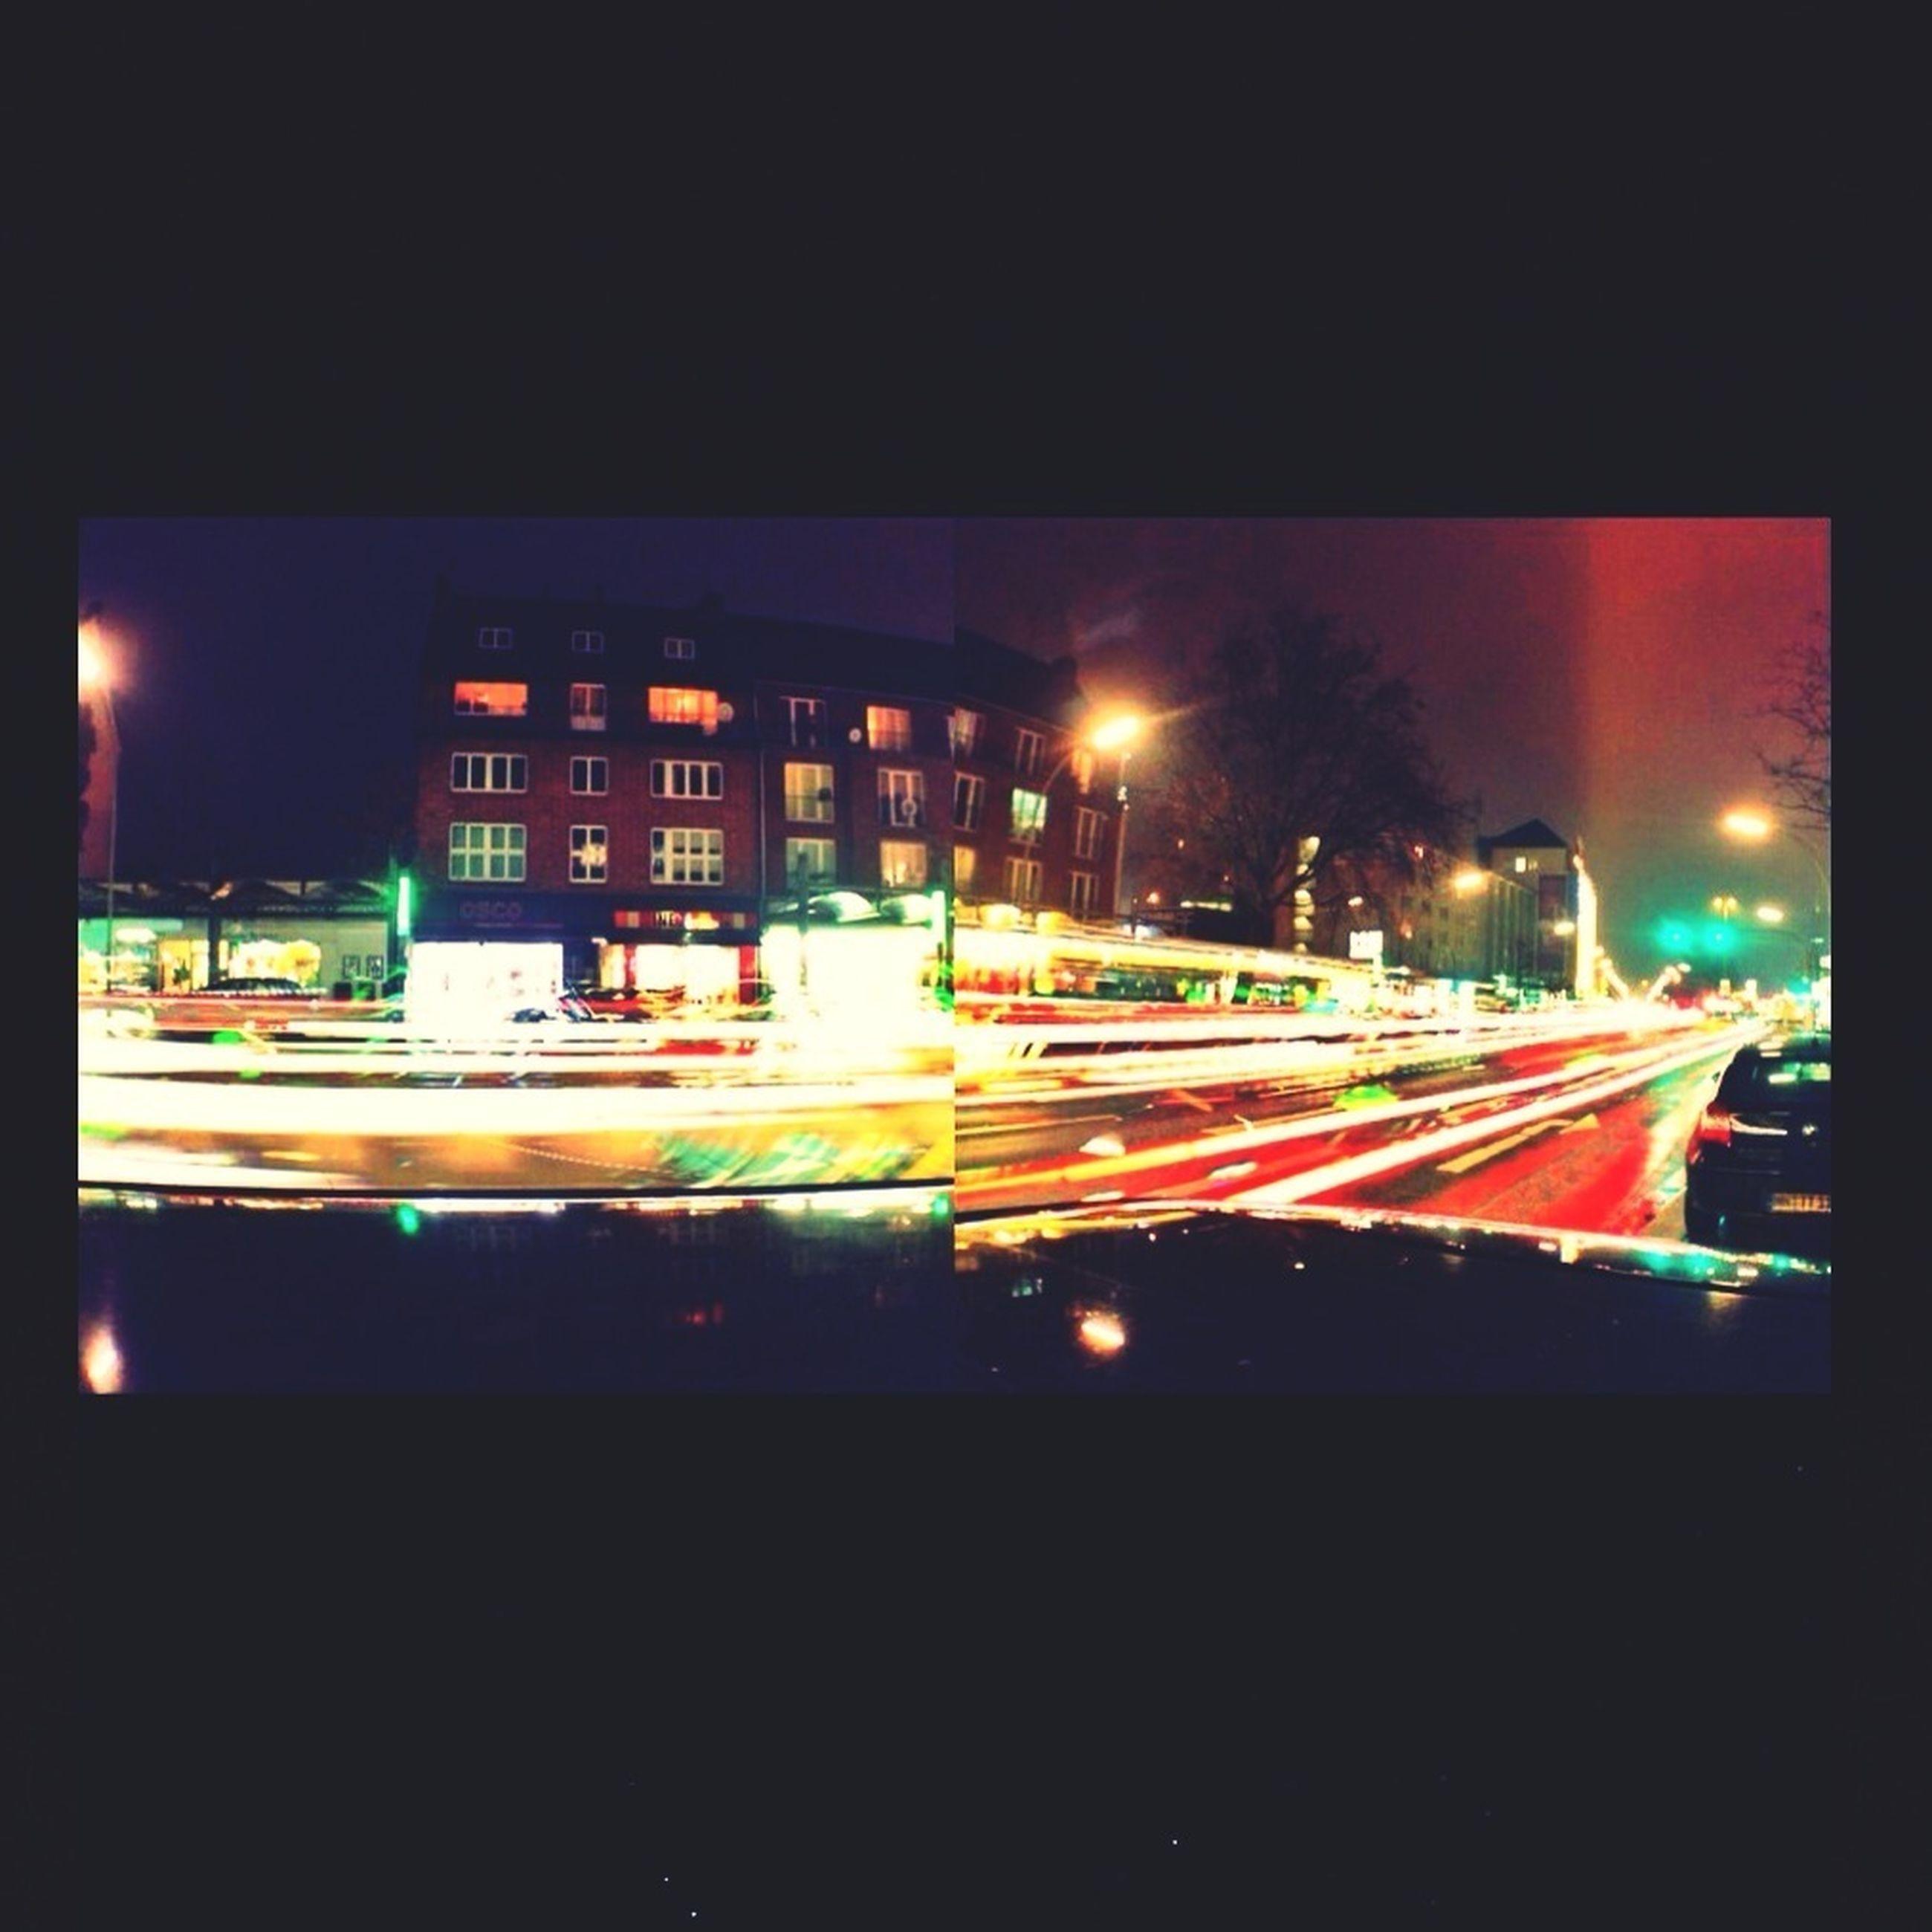 illuminated, night, building exterior, architecture, city, long exposure, built structure, light trail, motion, transportation, speed, street, blurred motion, city life, light - natural phenomenon, car, glowing, lighting equipment, dark, street light